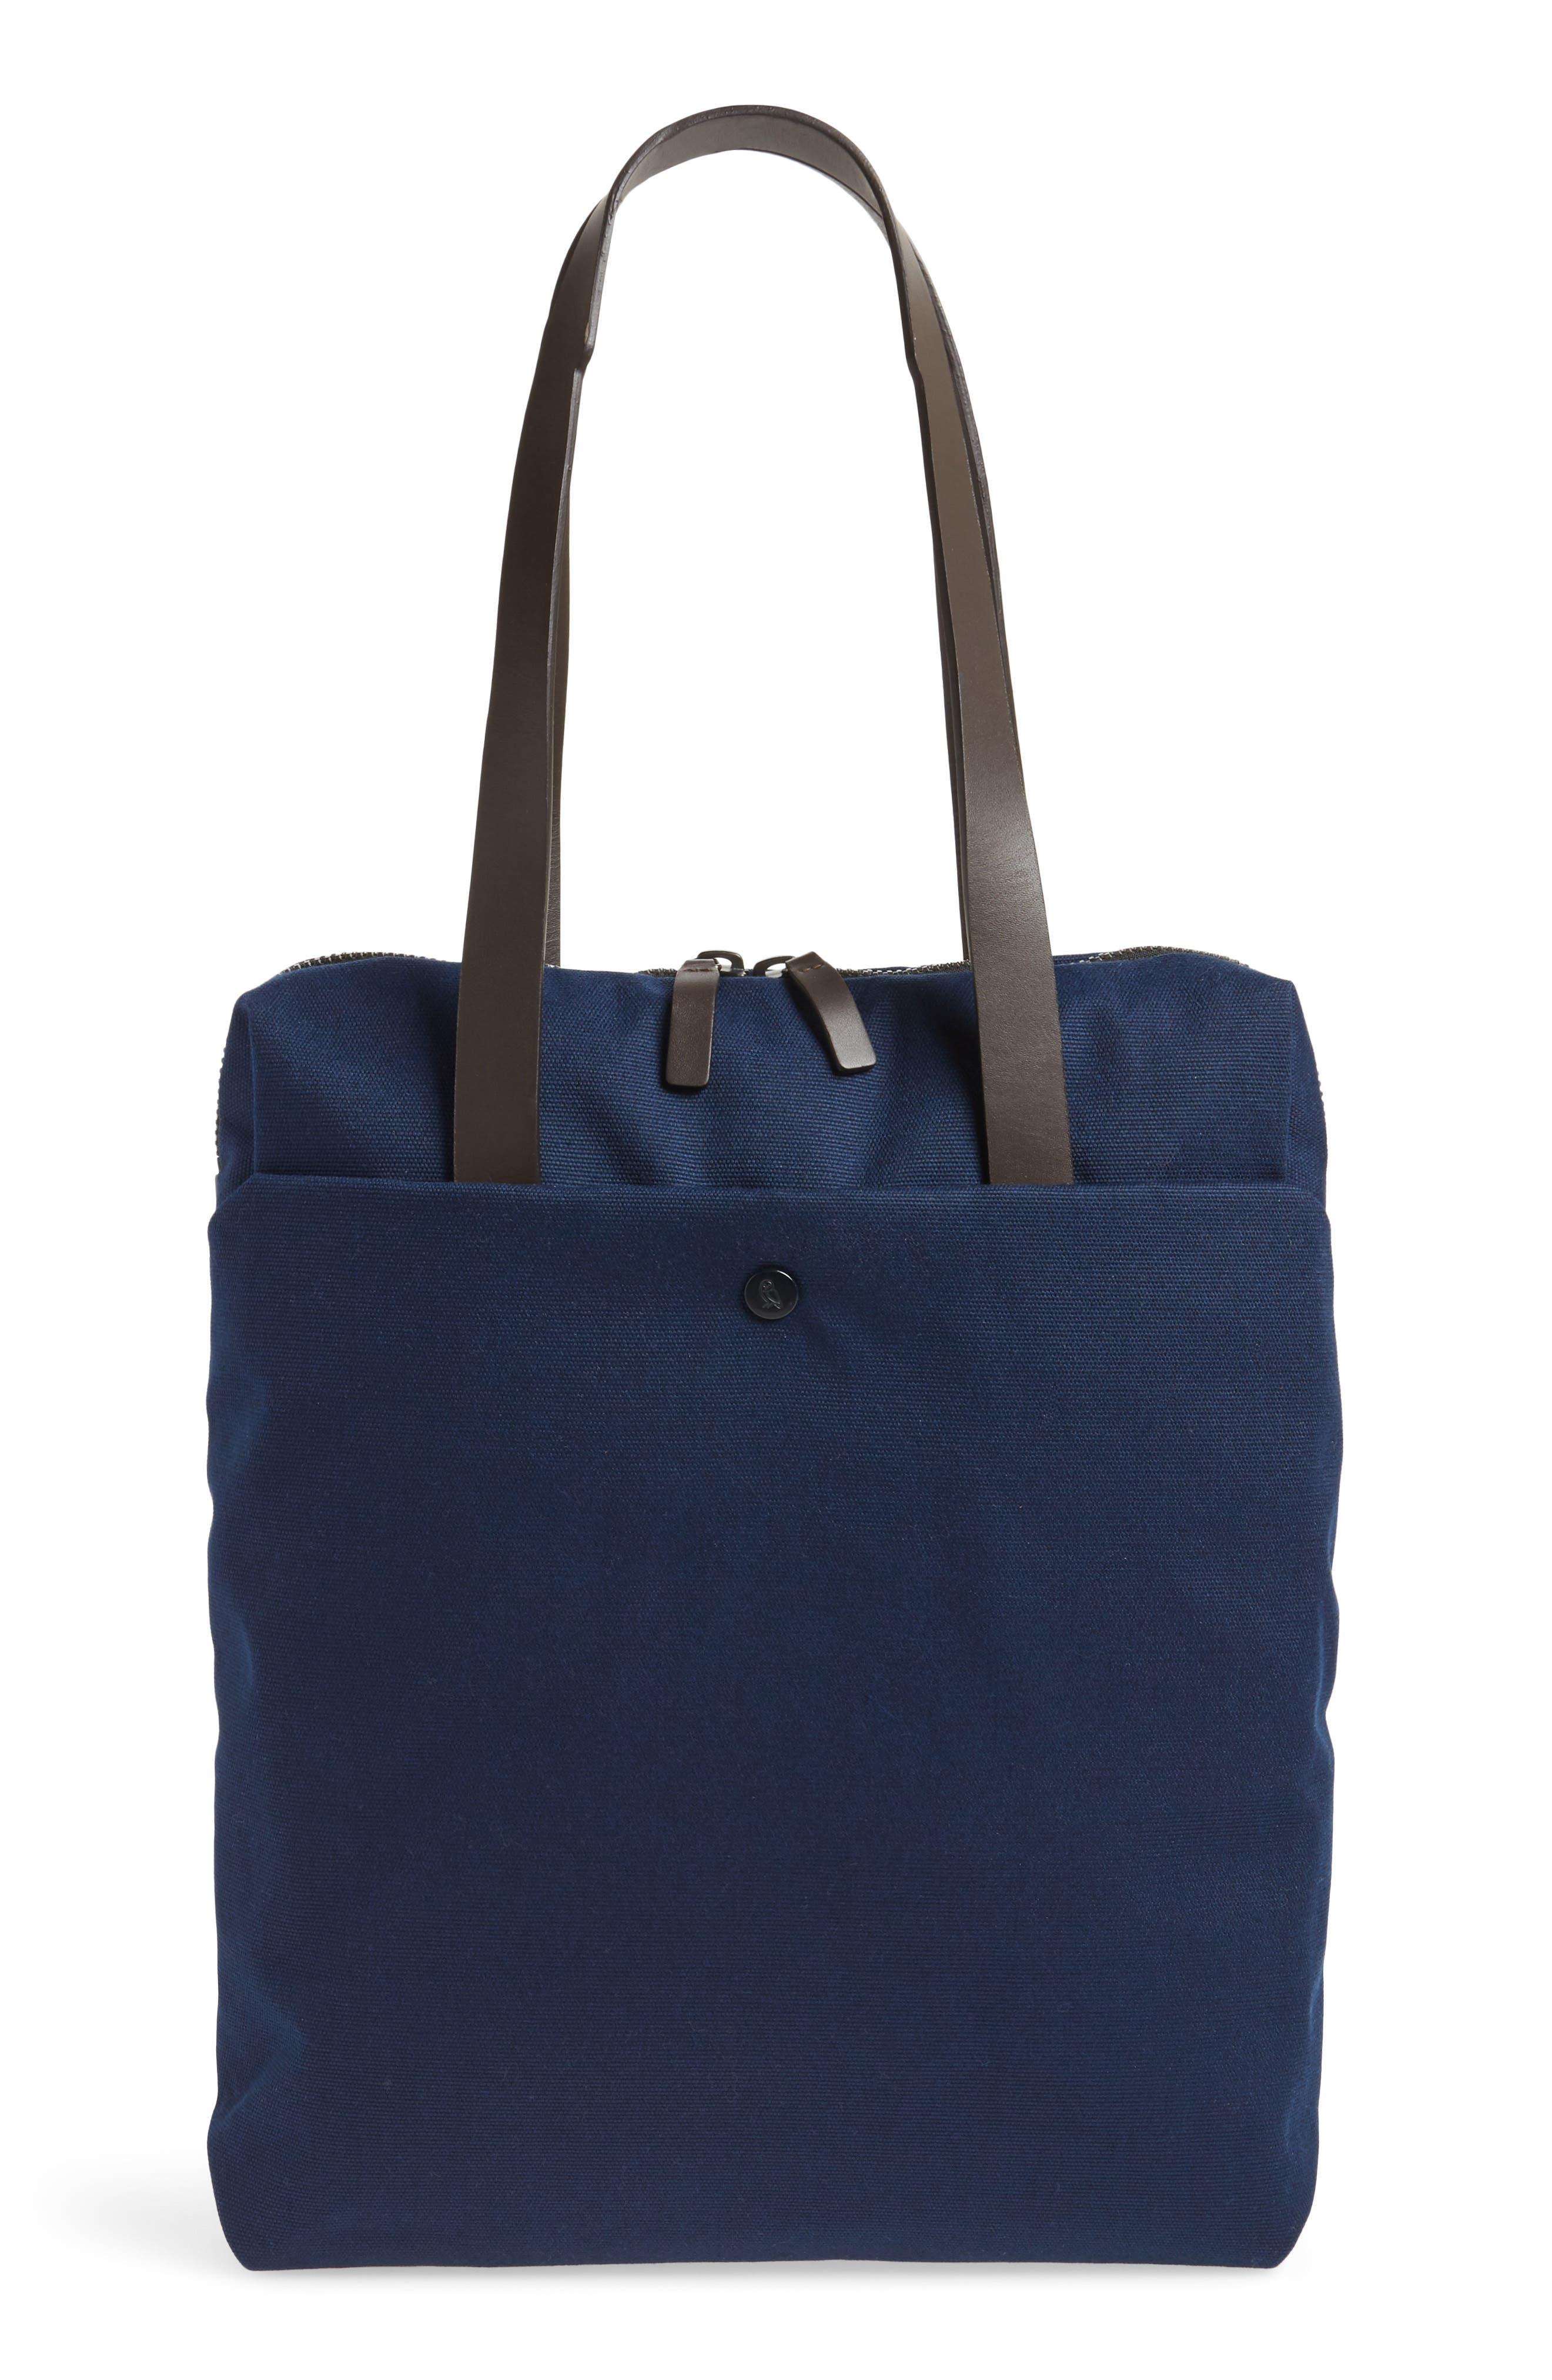 Alternate Image 1 Selected - Bellroy Slim Tote Bag